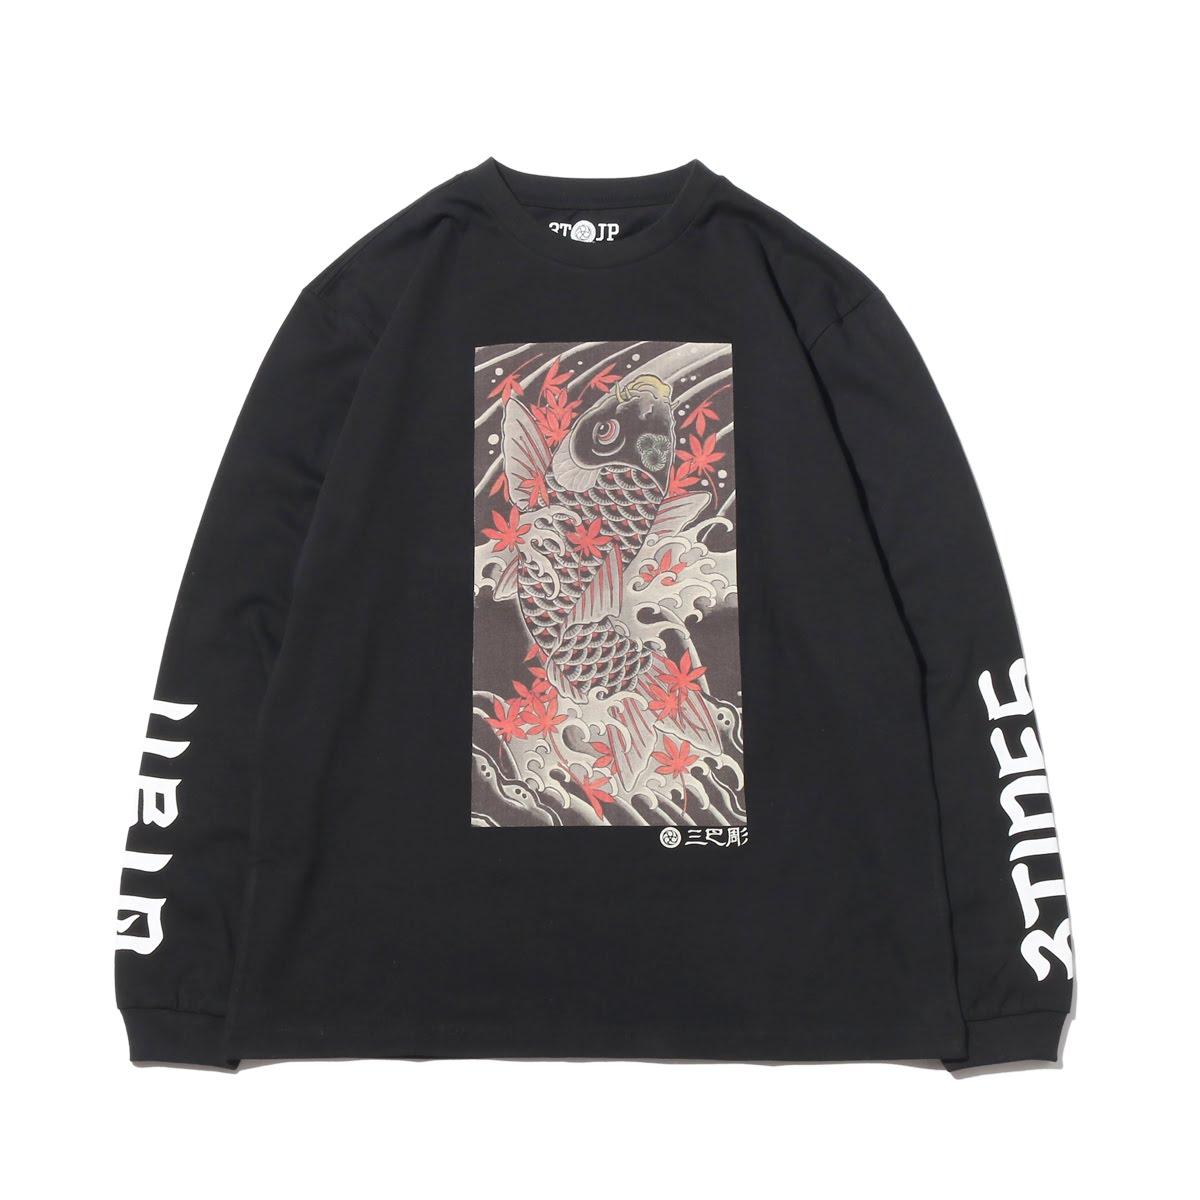 "UBIQ ""IREZUMI"" LS T-SHIRT(Koi) Designed by MATSUO(イレズミ ロングスリーブ Tシャツ(コイ) デザインド バイ マツオ)(BLACK)18SS-I"